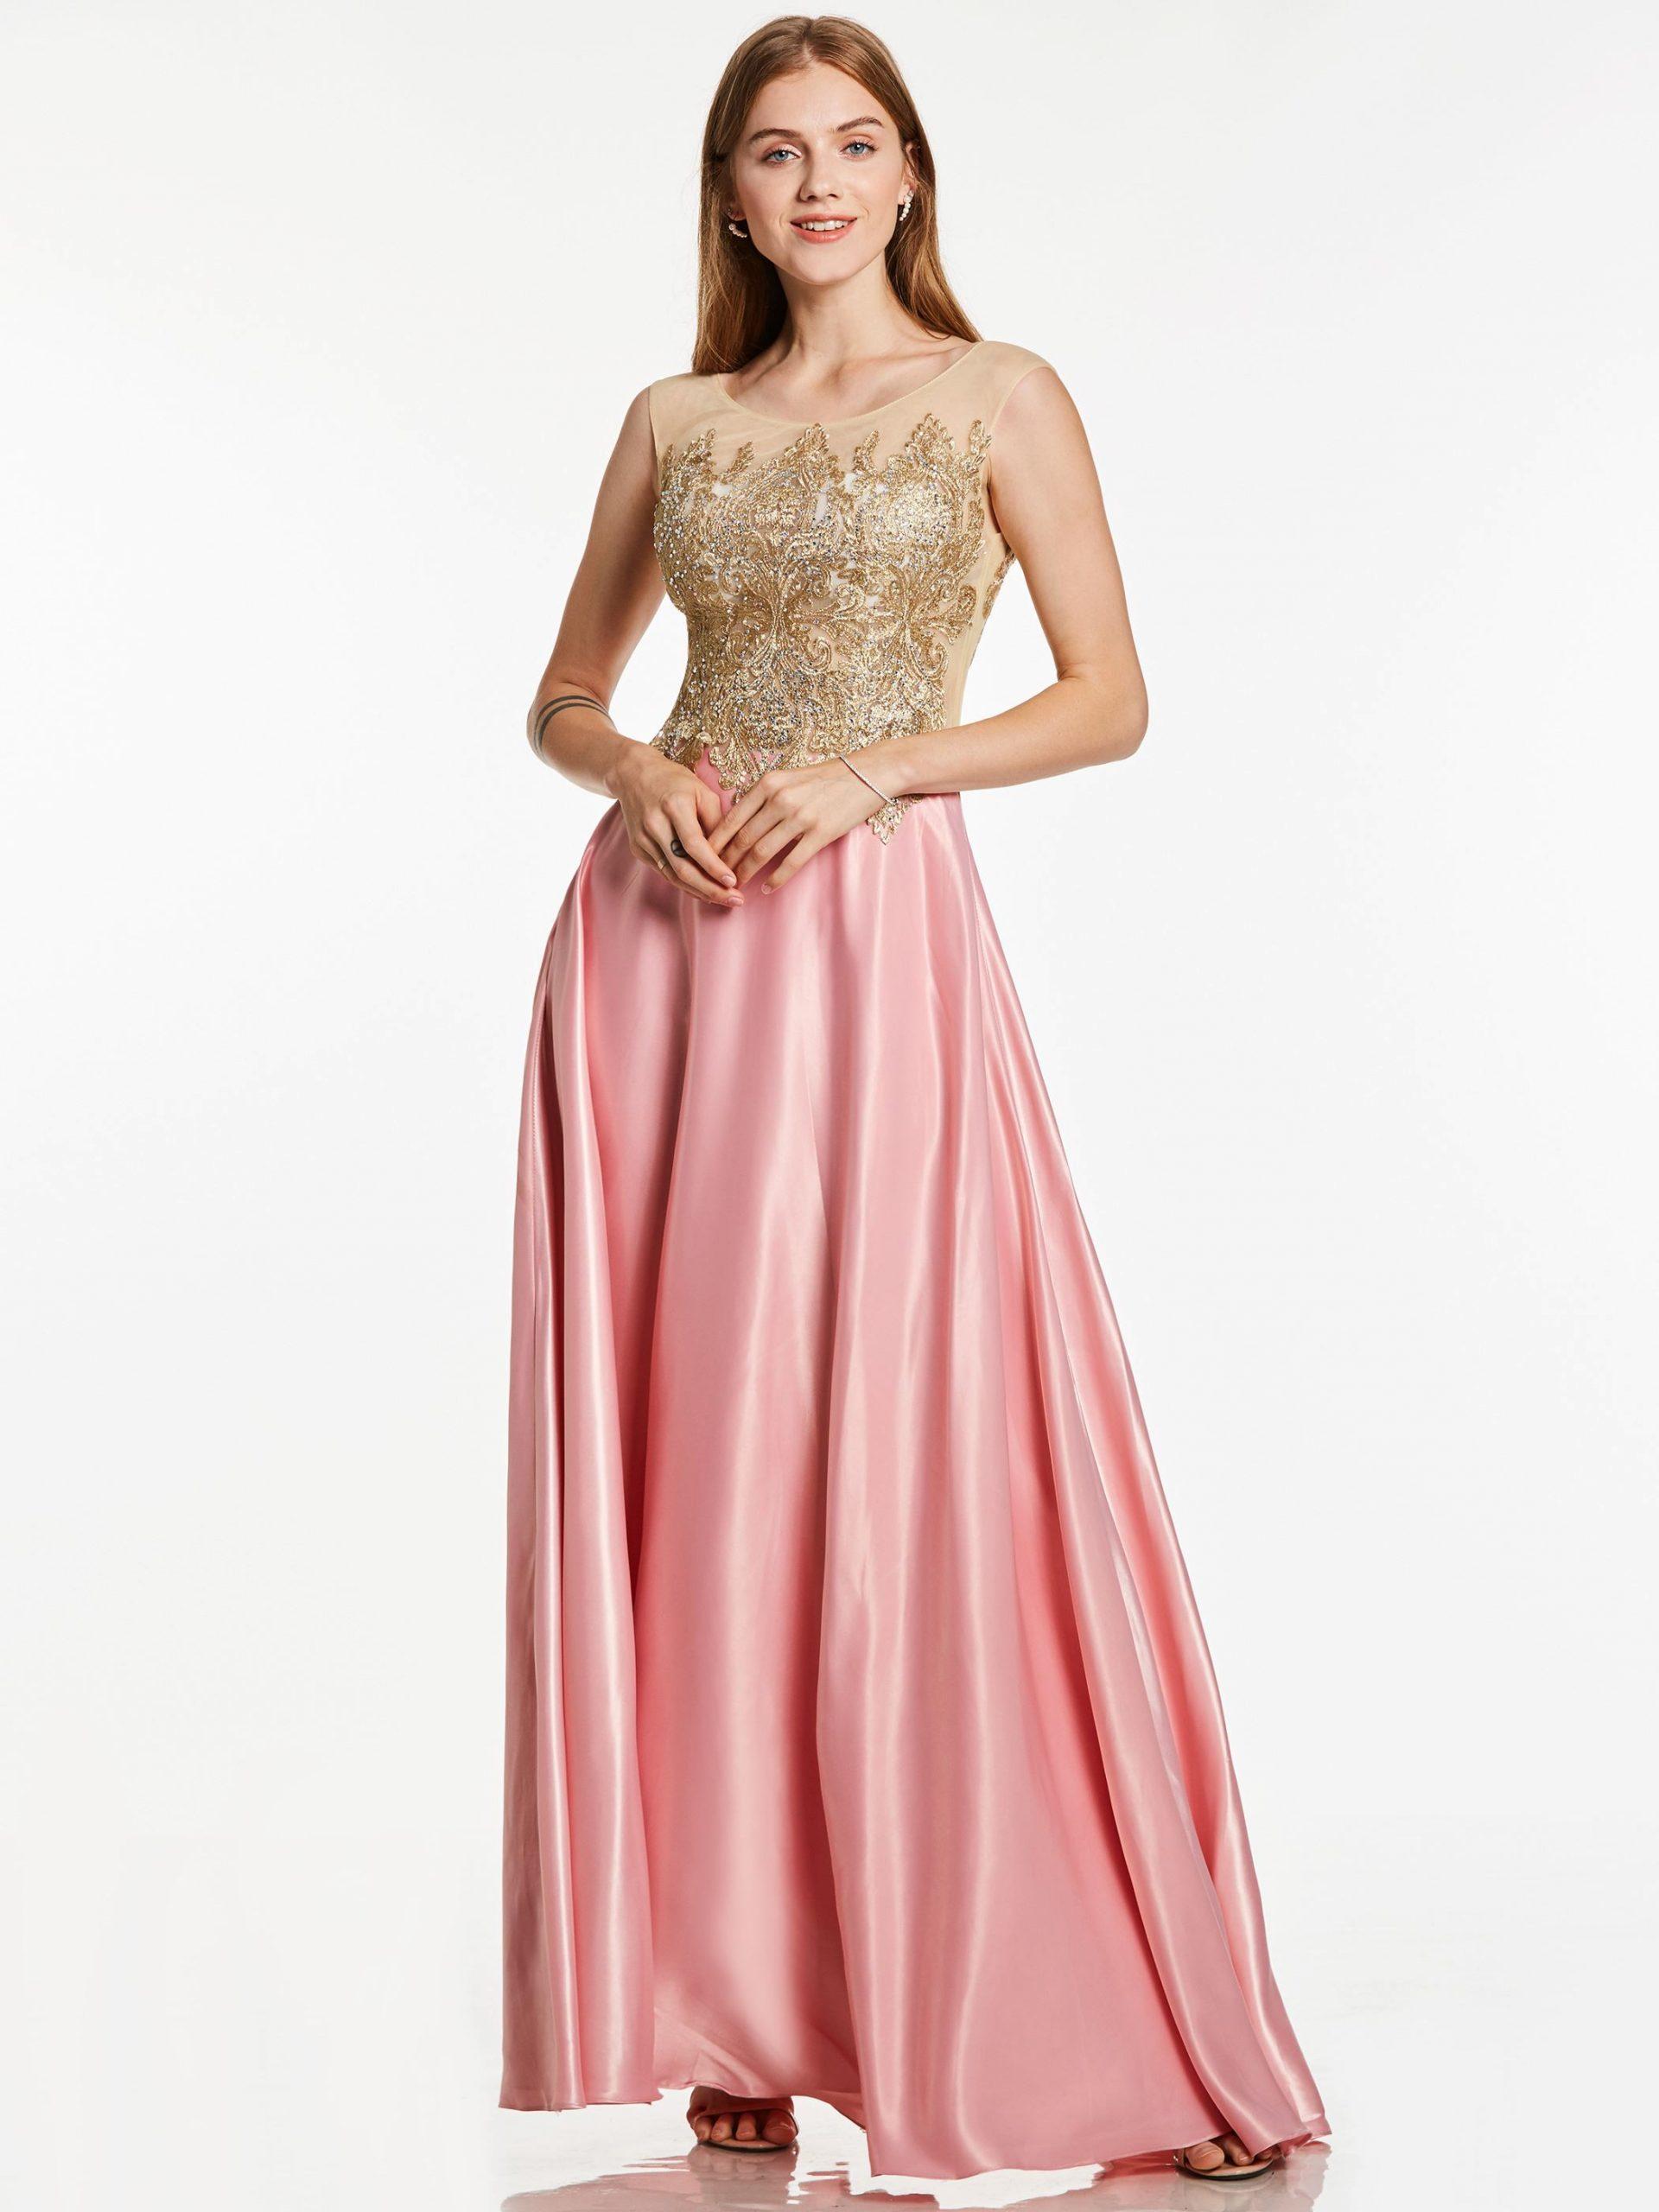 Luxurius Sommer Abend Kleid Stylish13 Genial Sommer Abend Kleid Bester Preis